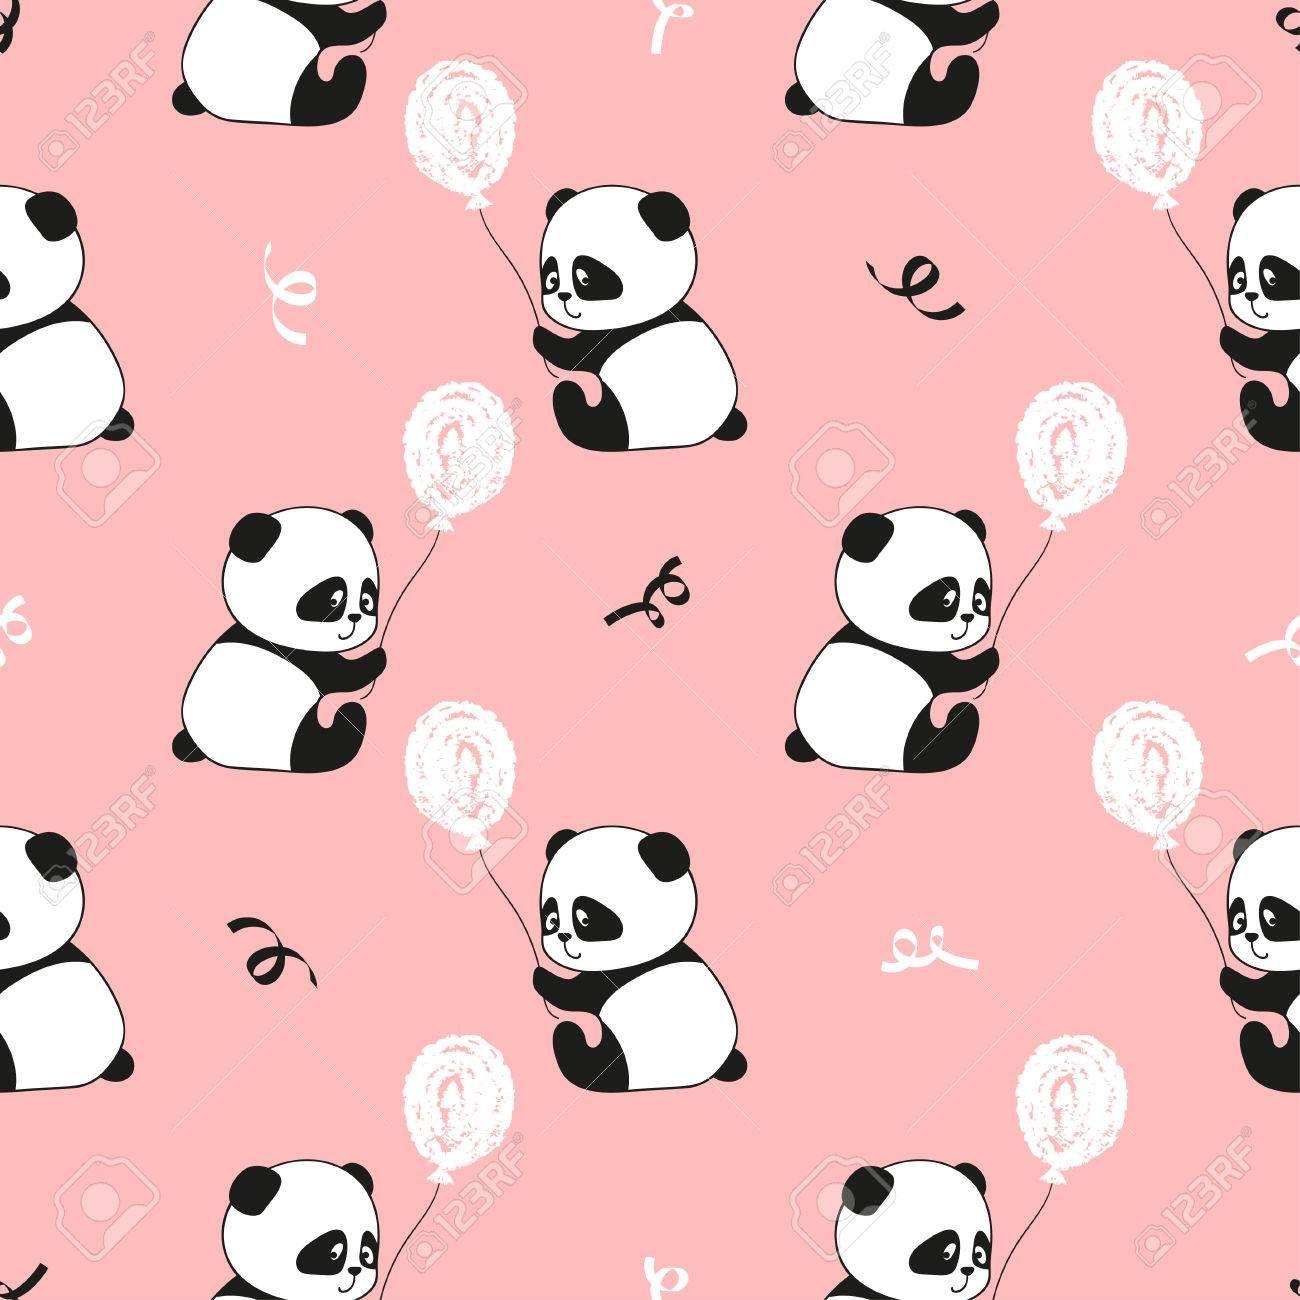 Cute Panda Bears And Balloons Vector Kids Background Royalty Free Cute Girl Wallpaper Kids Background Cute Panda